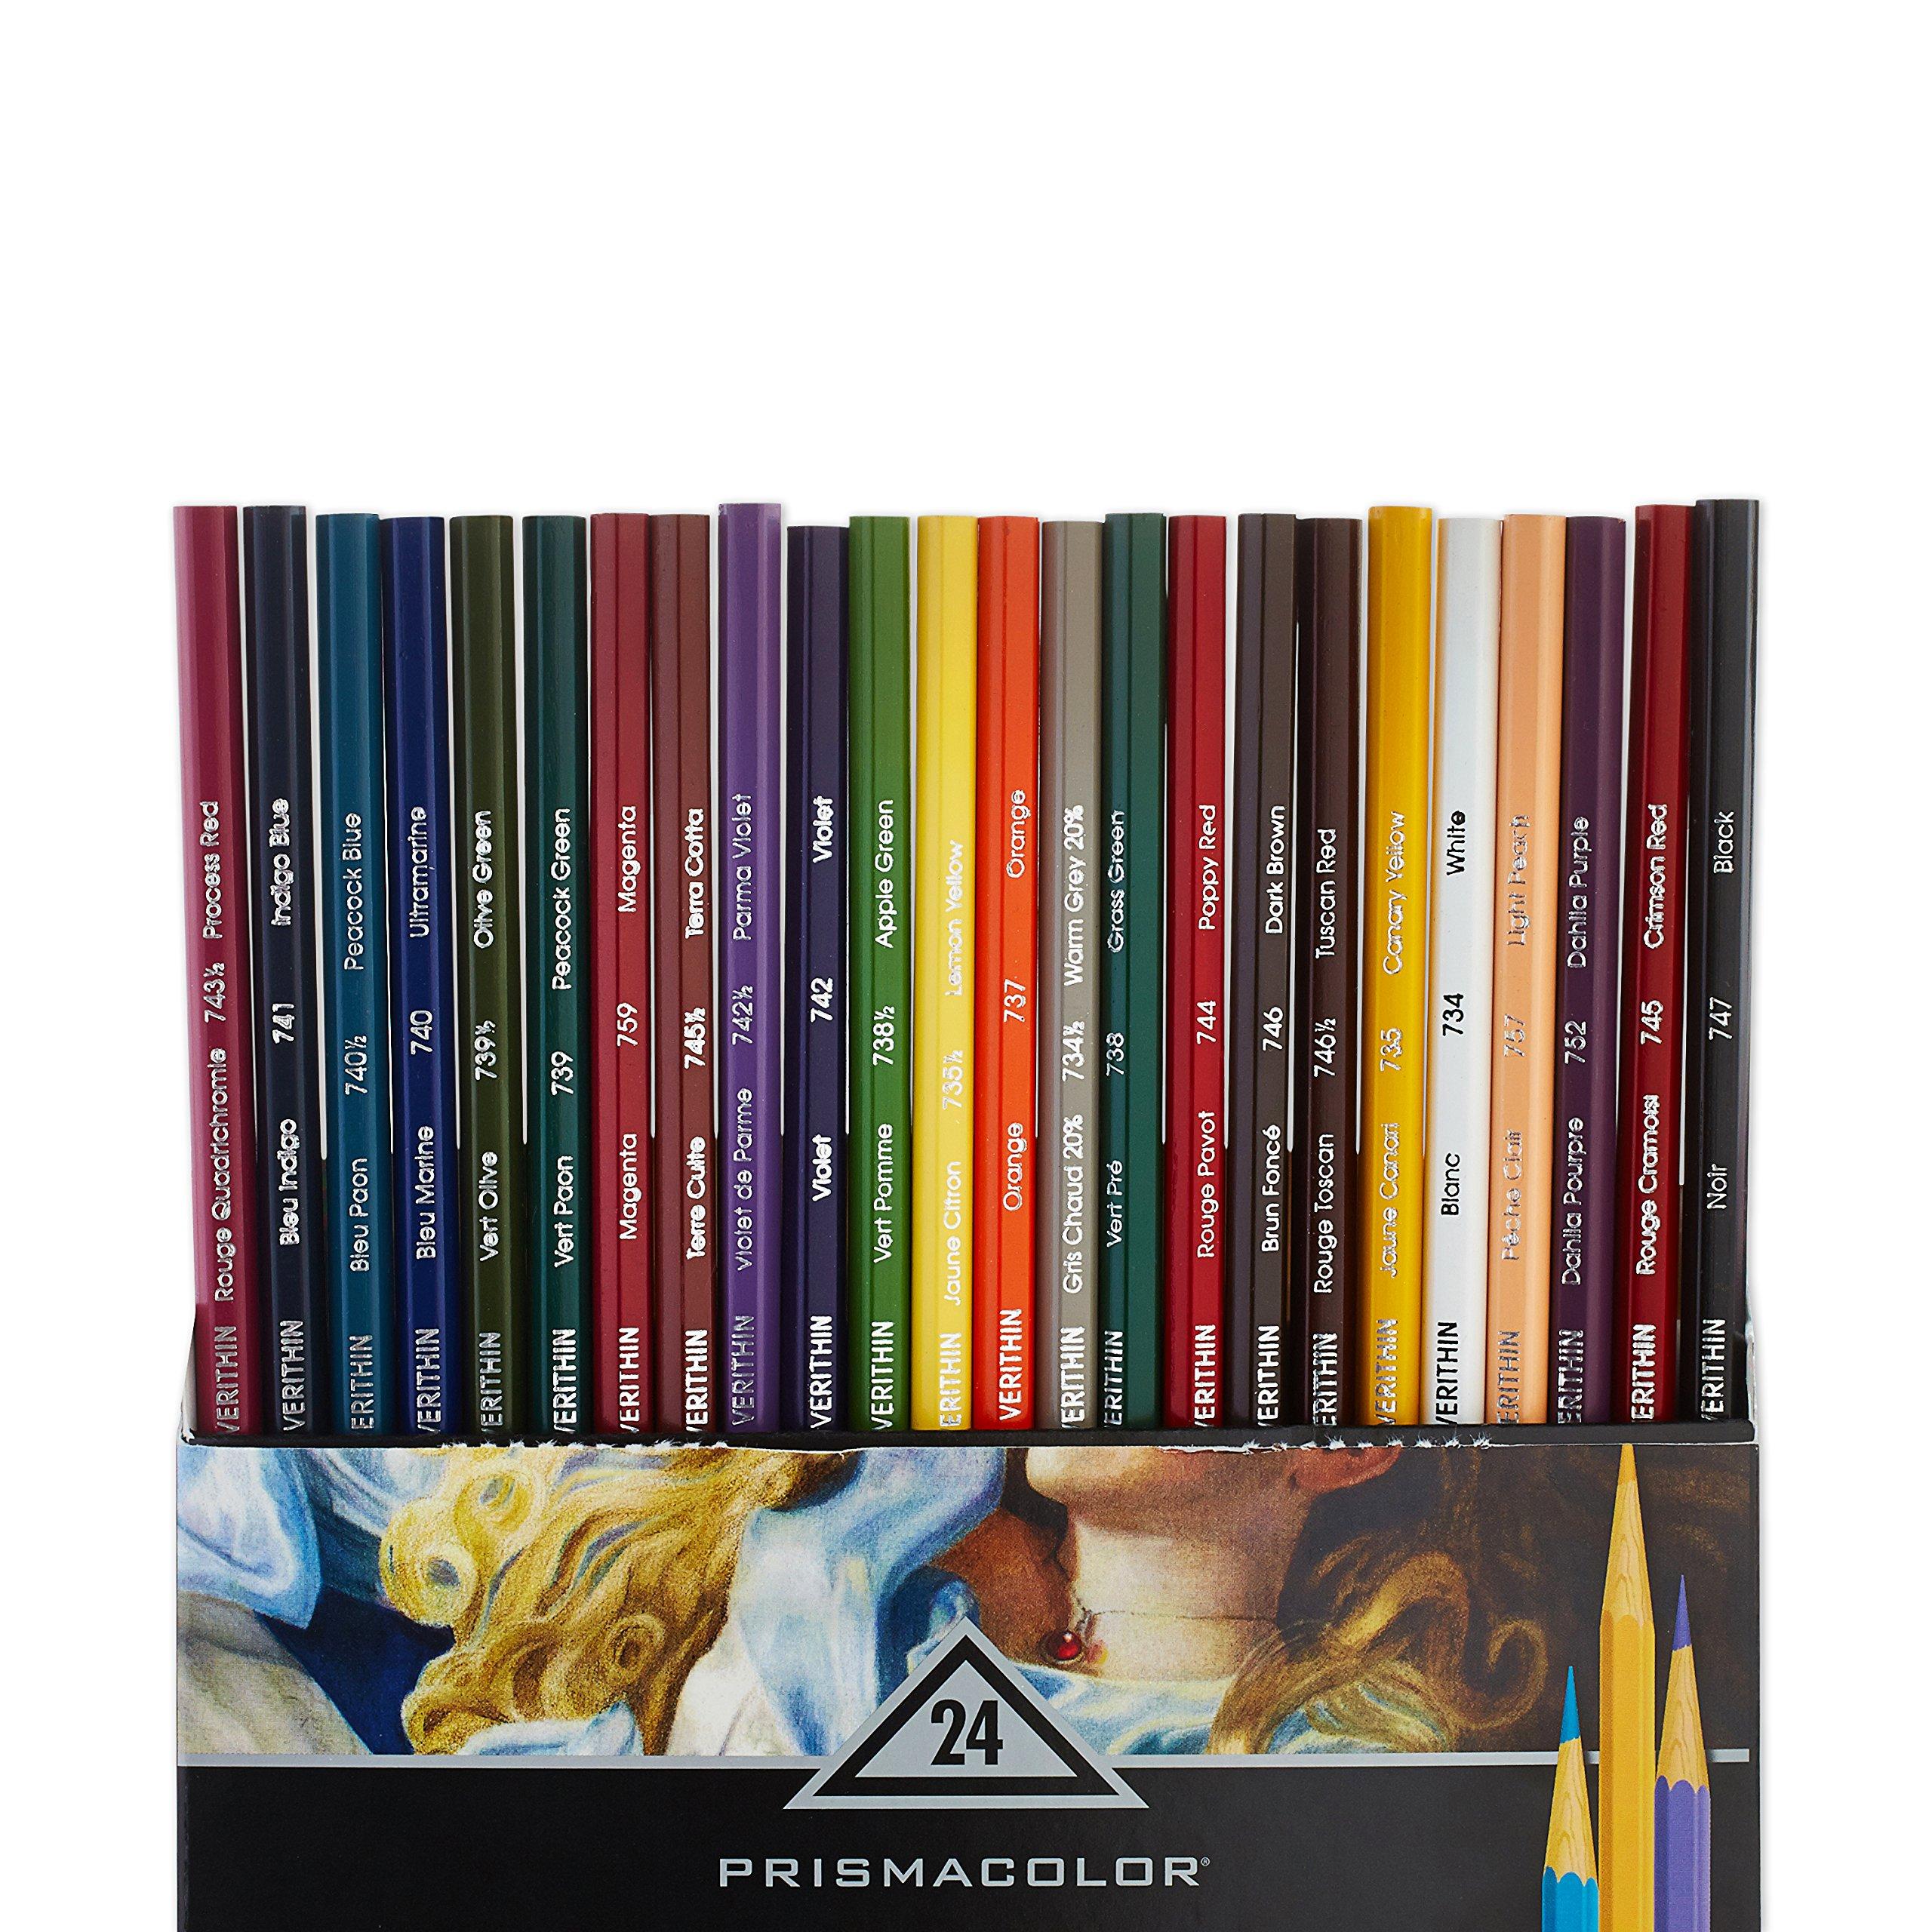 Prismacolor 2427 Premier Verithin Colored Pencils, 24-Count by PRISMACOLOR